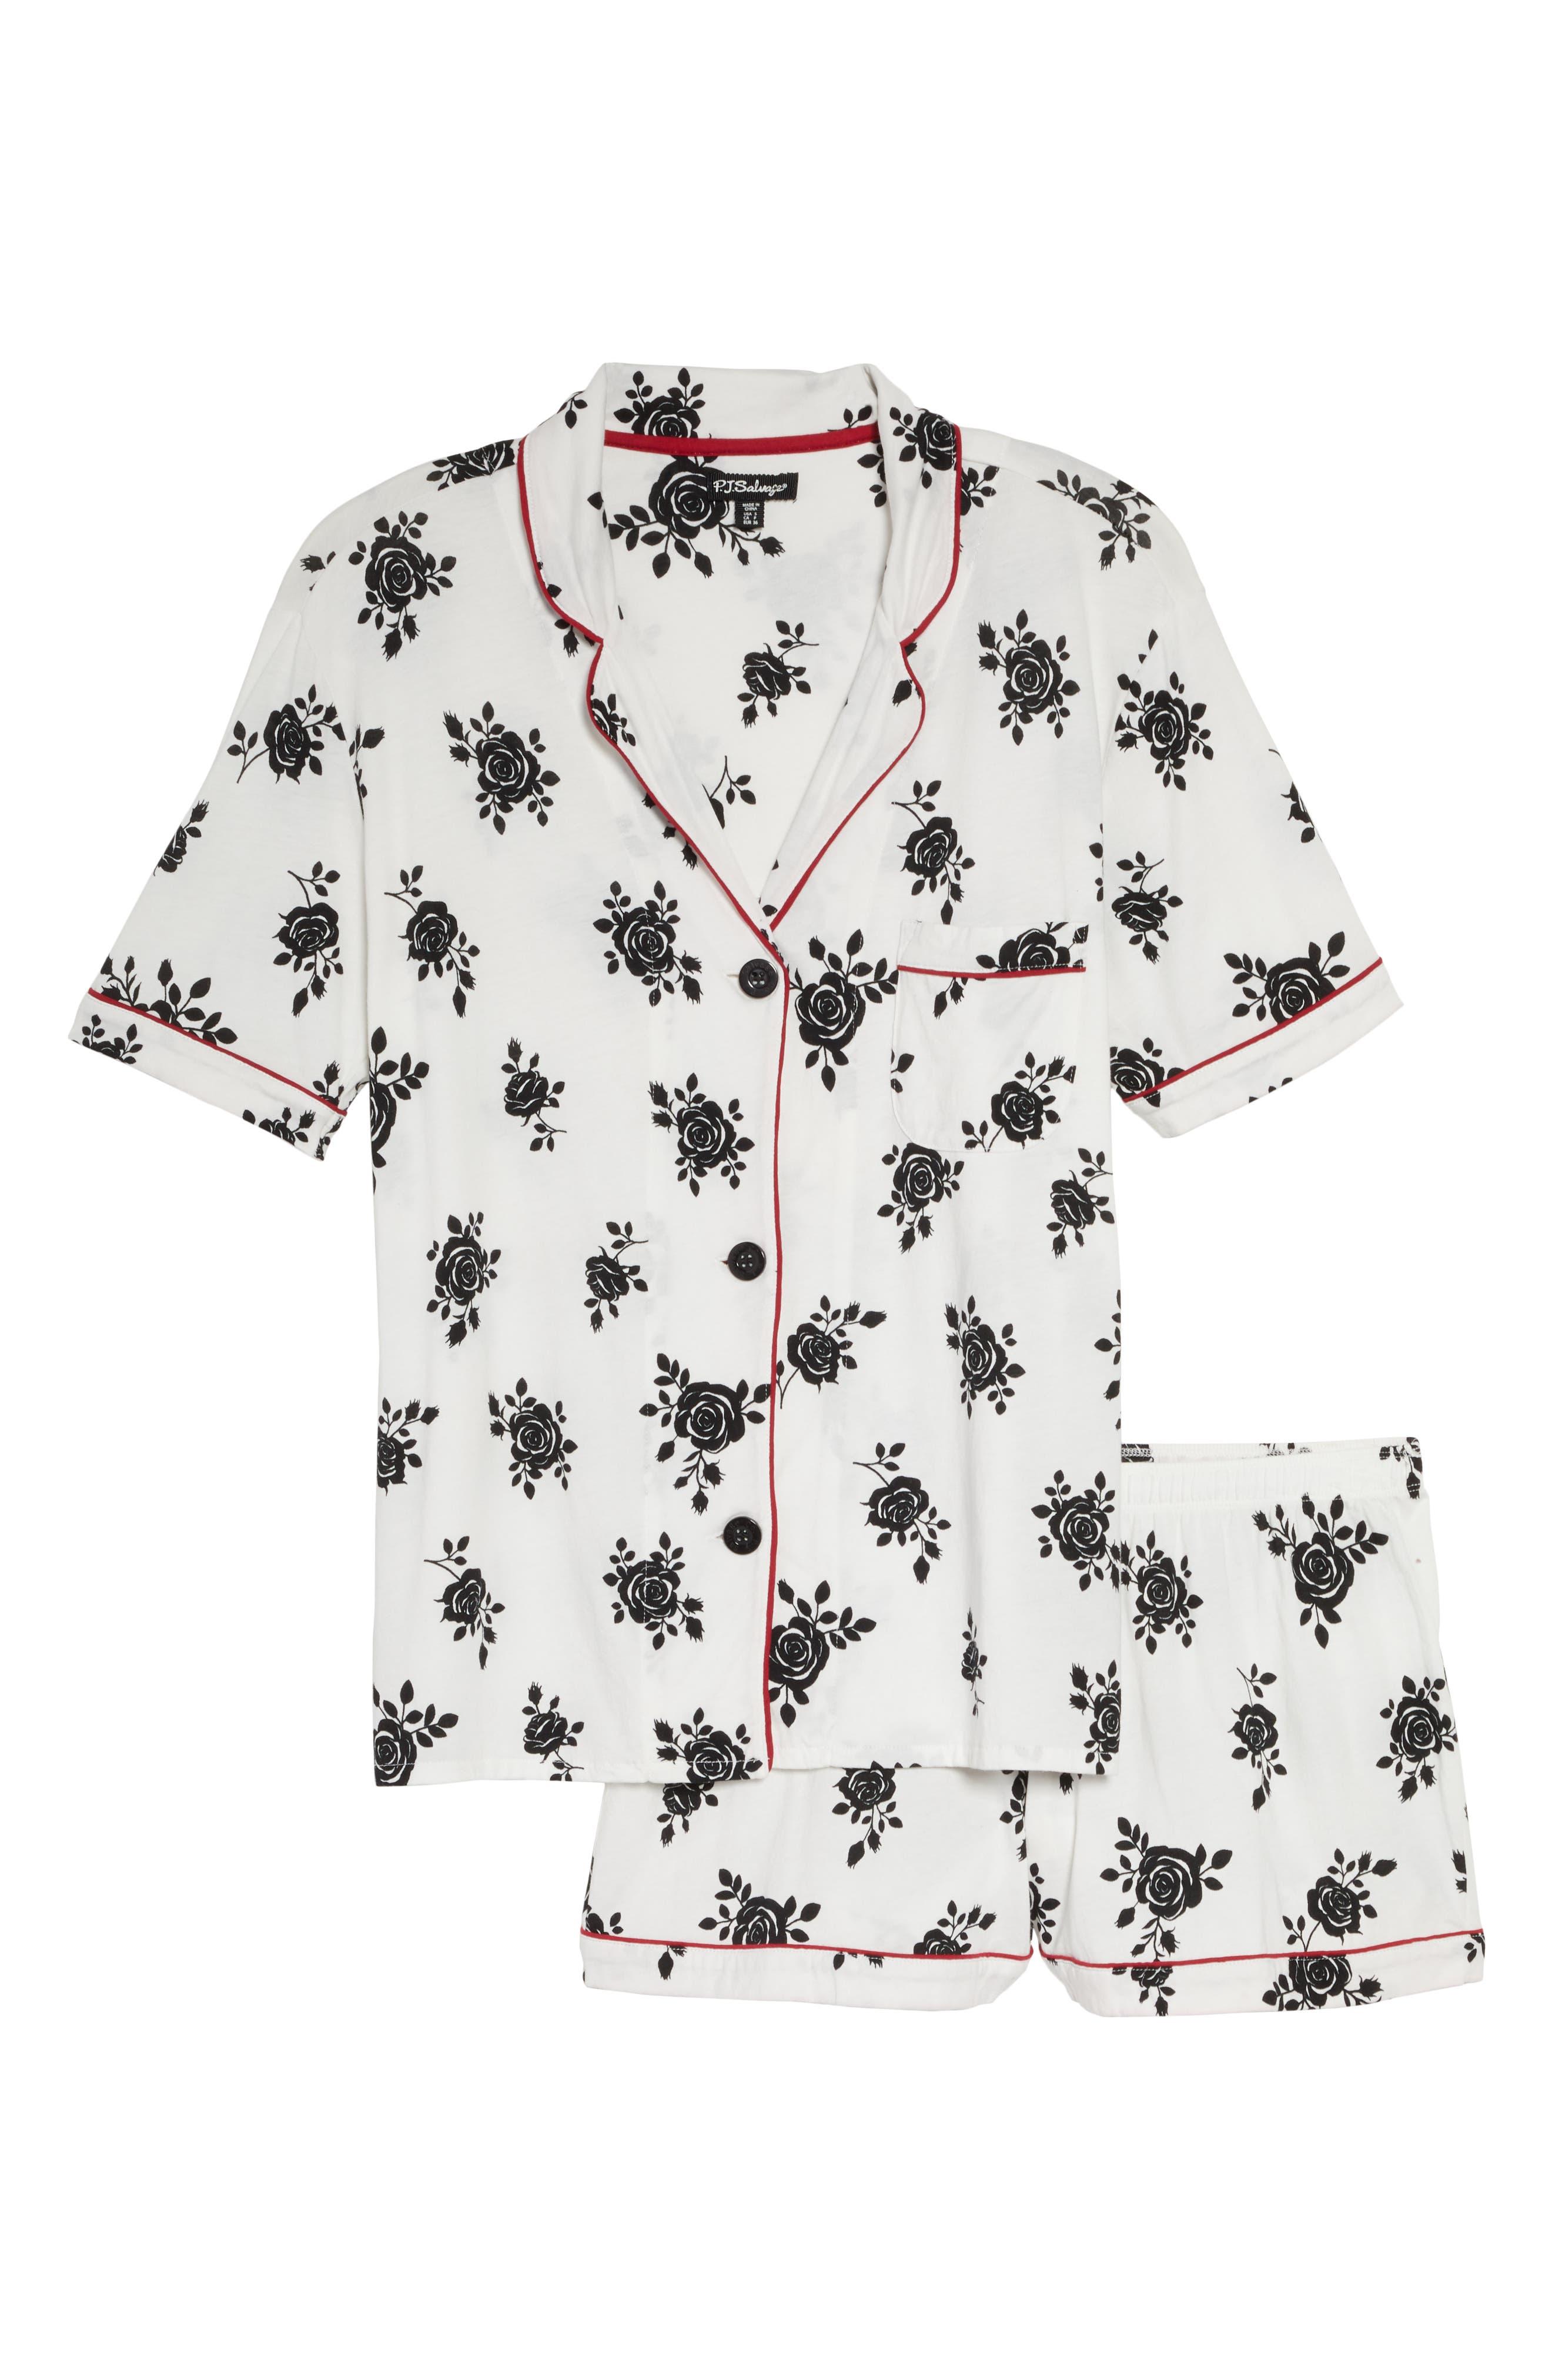 PJ SALVAGE, Give Love Short Pajamas, Alternate thumbnail 6, color, IVORY